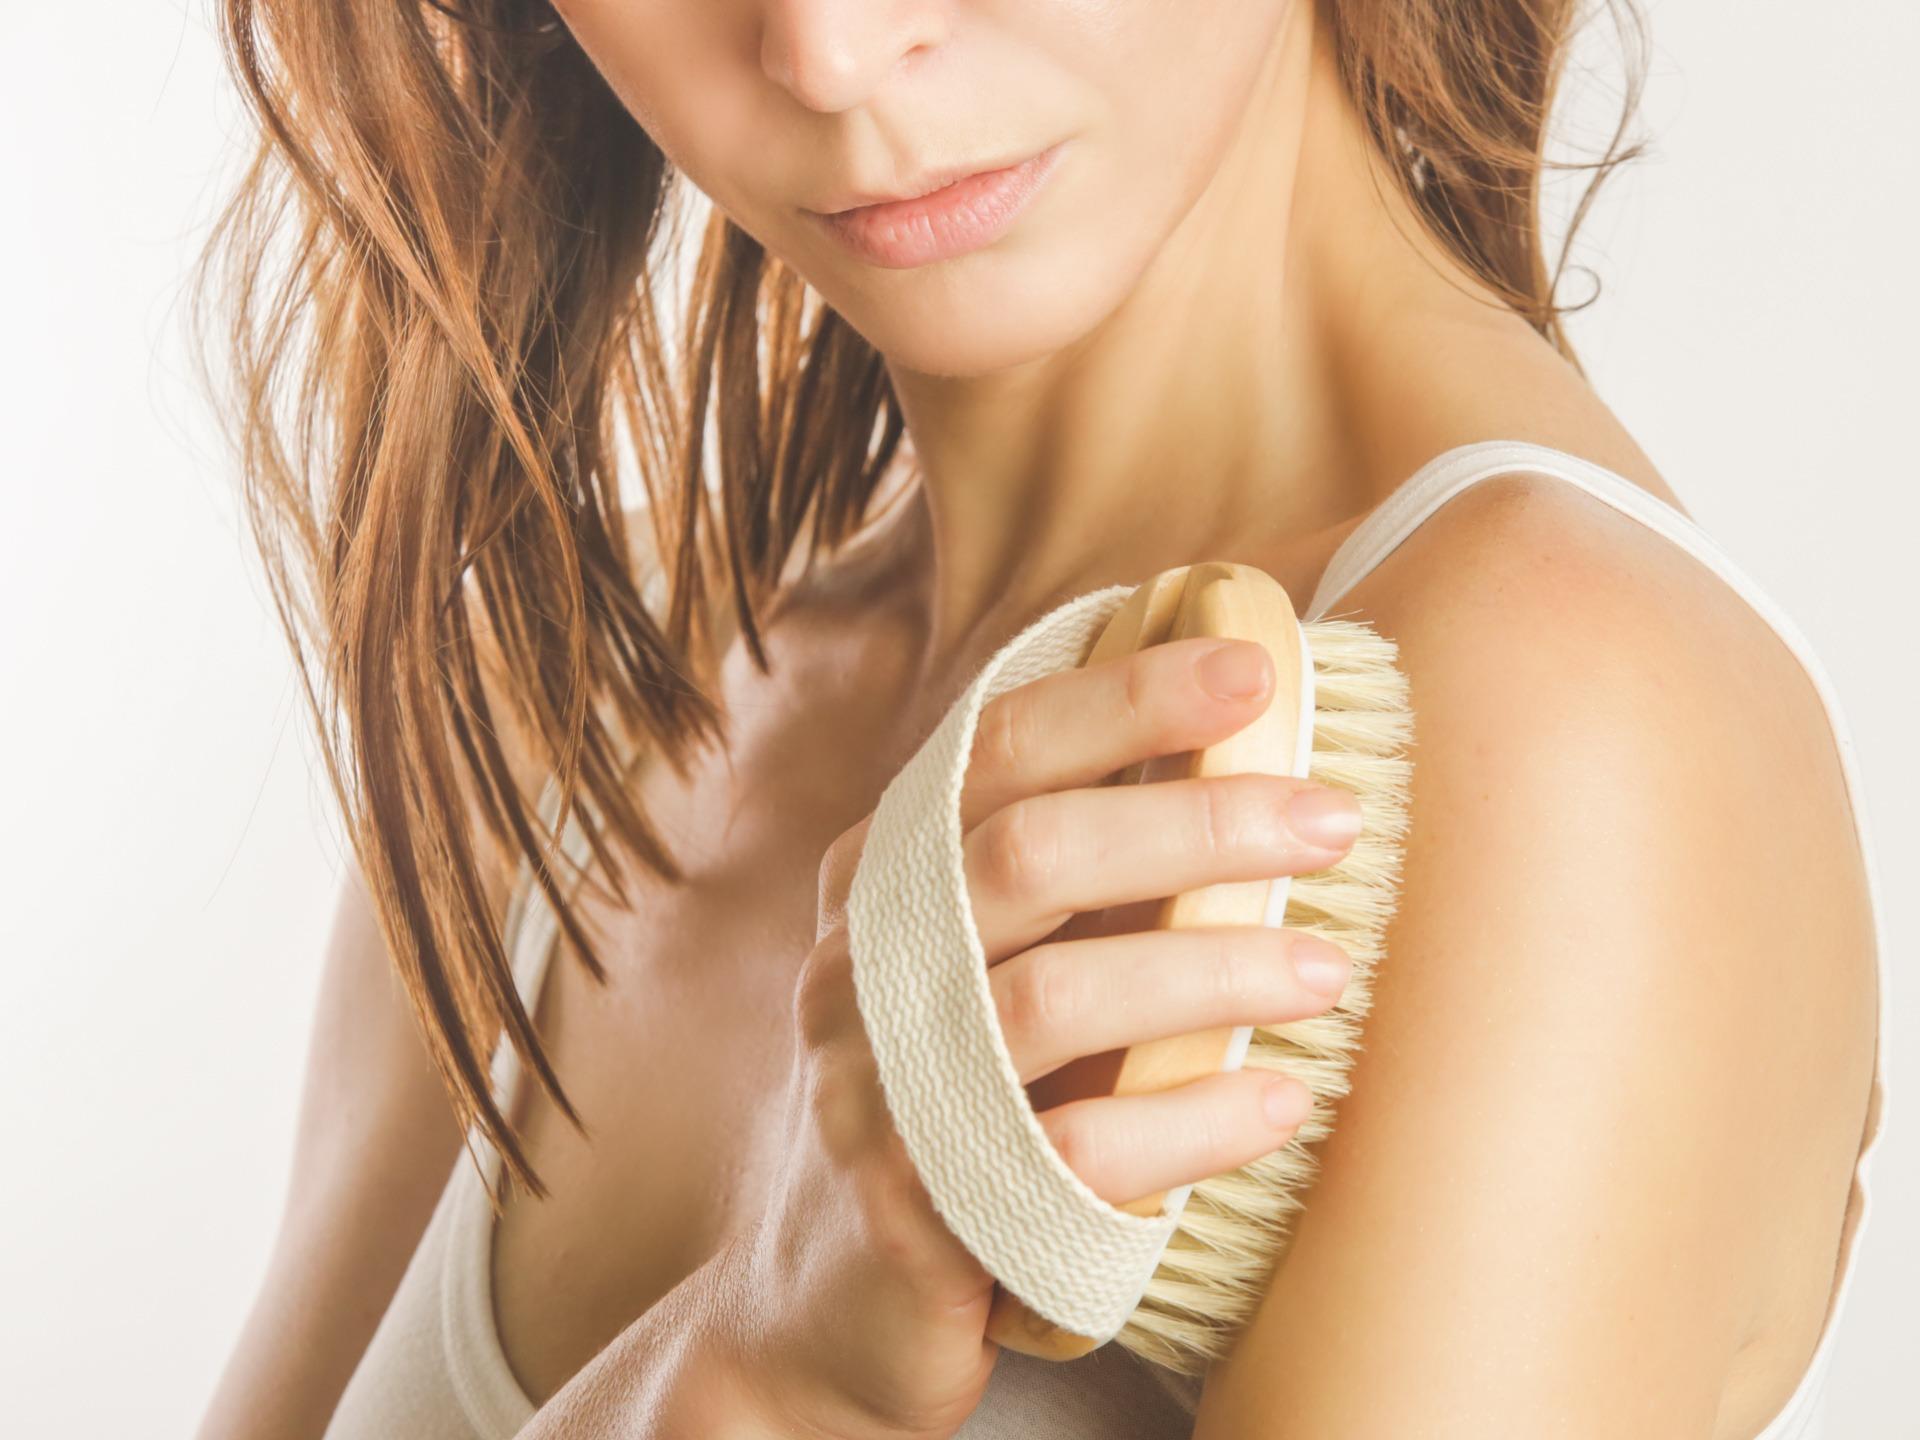 Dry body brush, Woman dry brushing body to reduce cellulite, det